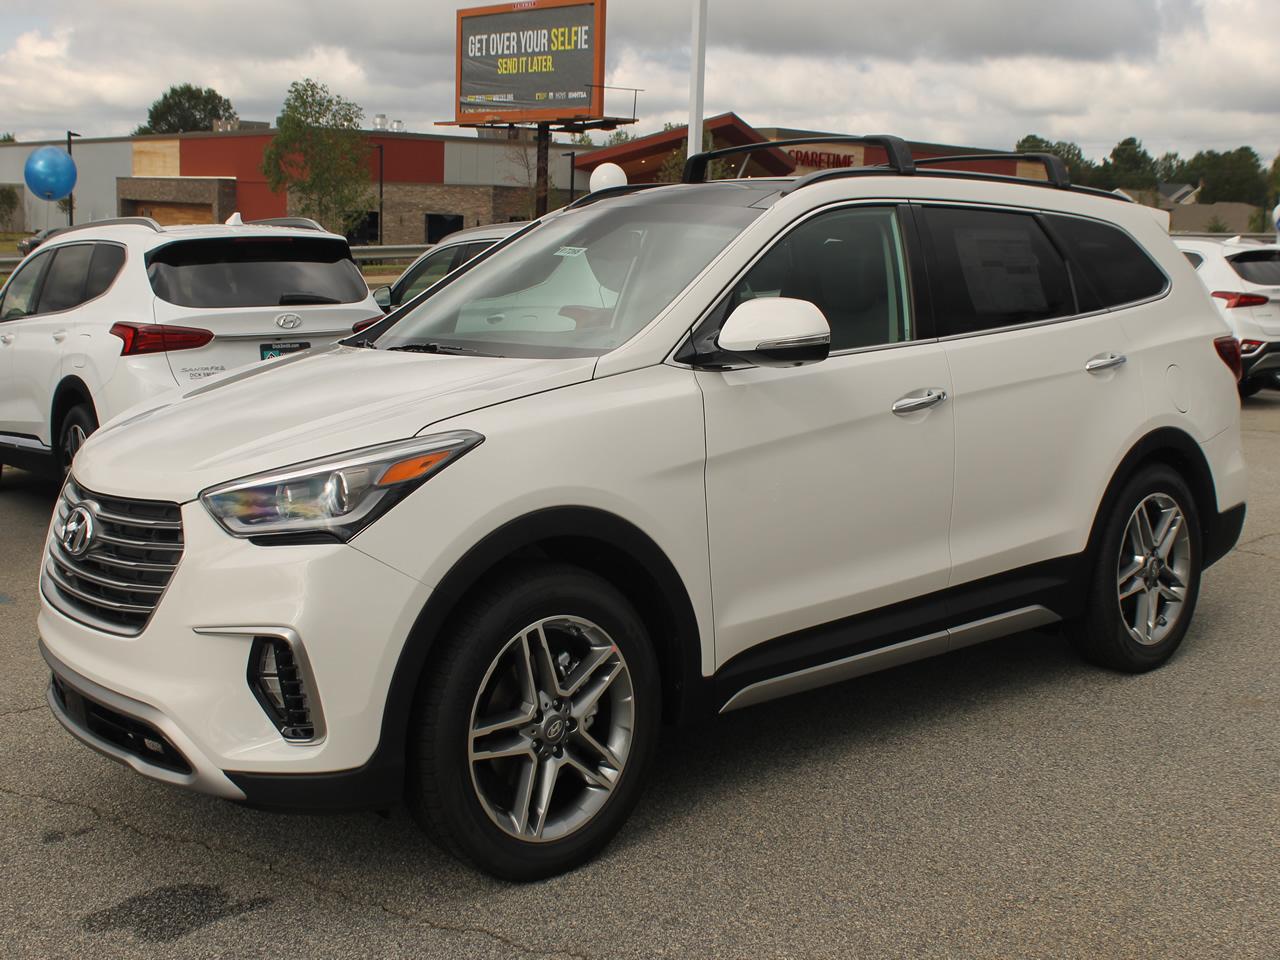 Dick Smith Hyundai >> NEW 2019 HYUNDAI SANTA FE XL LIMITED ULTIMATE VIN KM8SR4HF3KU297870 - Hyundai in Greenville ...